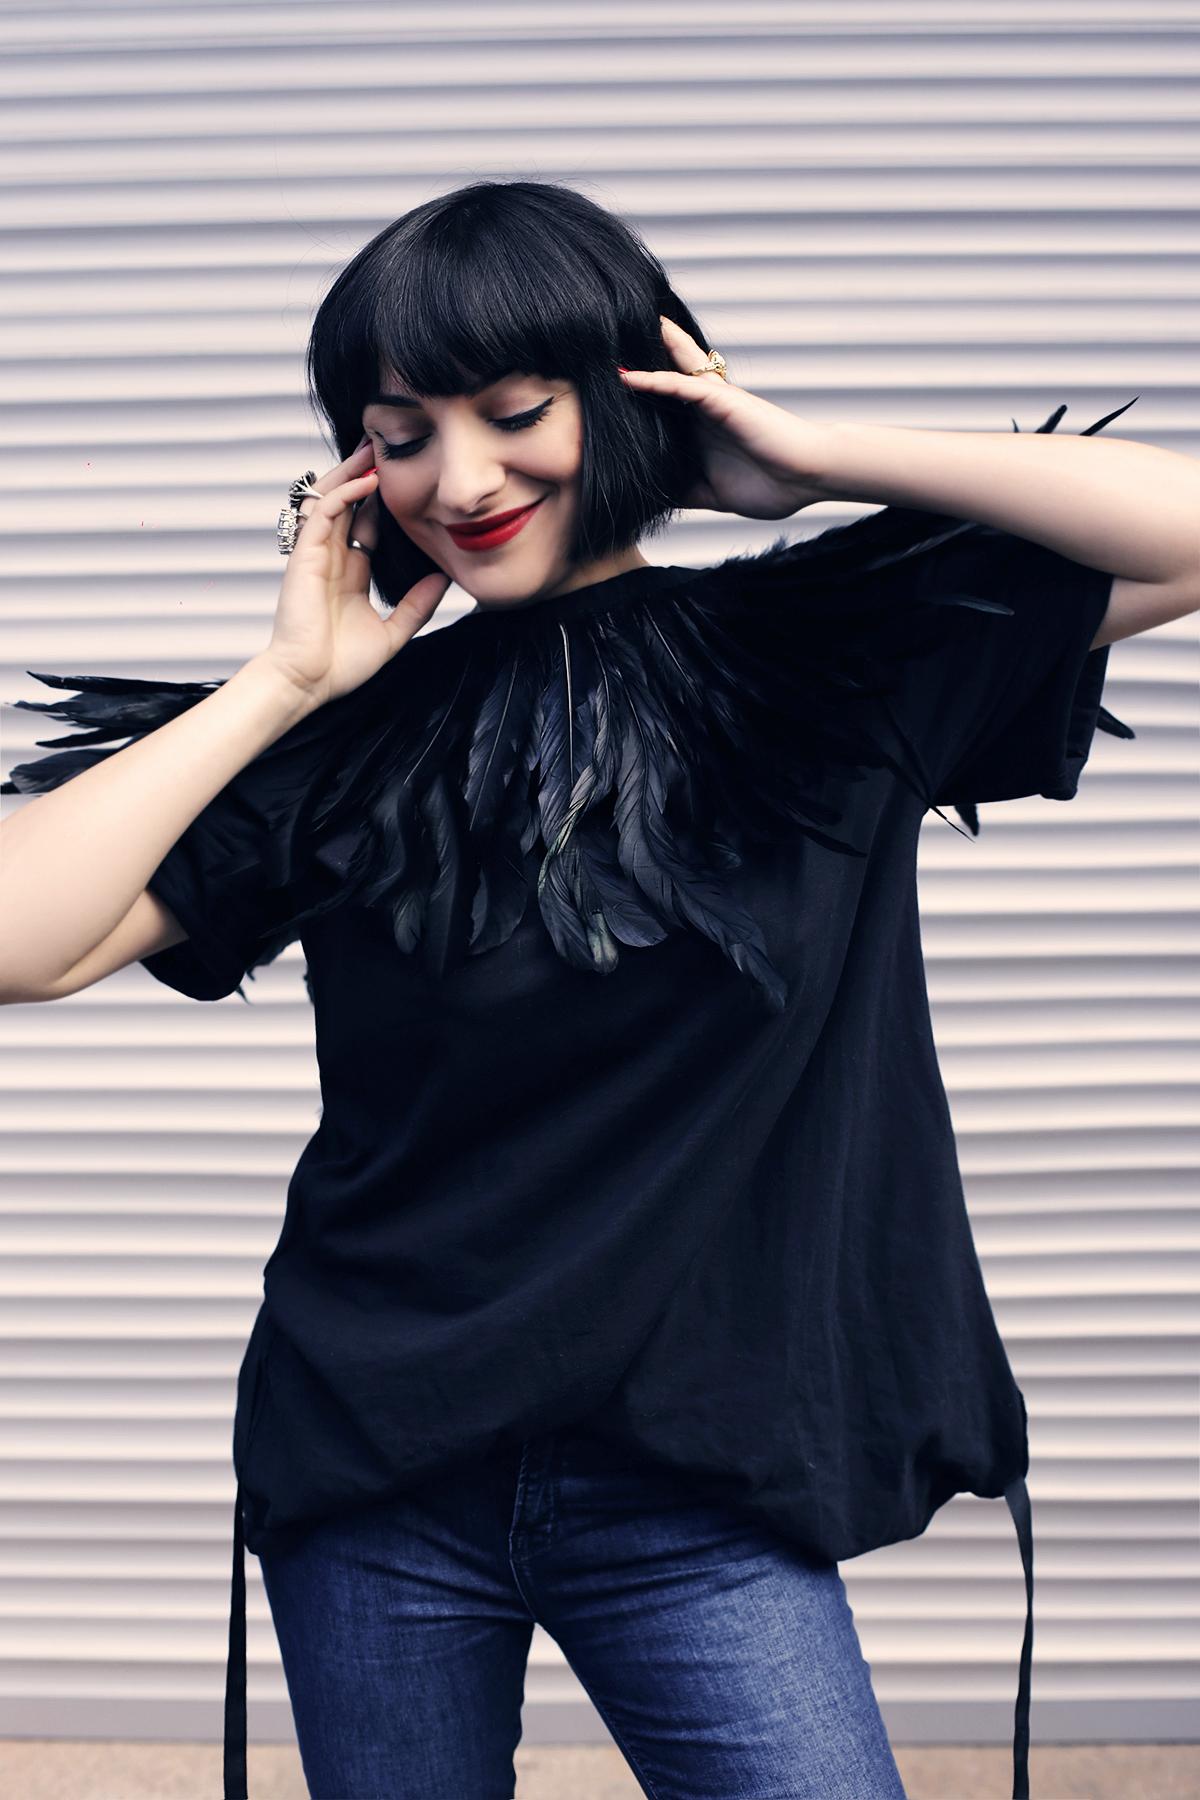 Ana Morodan wearing Book Cover Tee VI by Ana Morodan